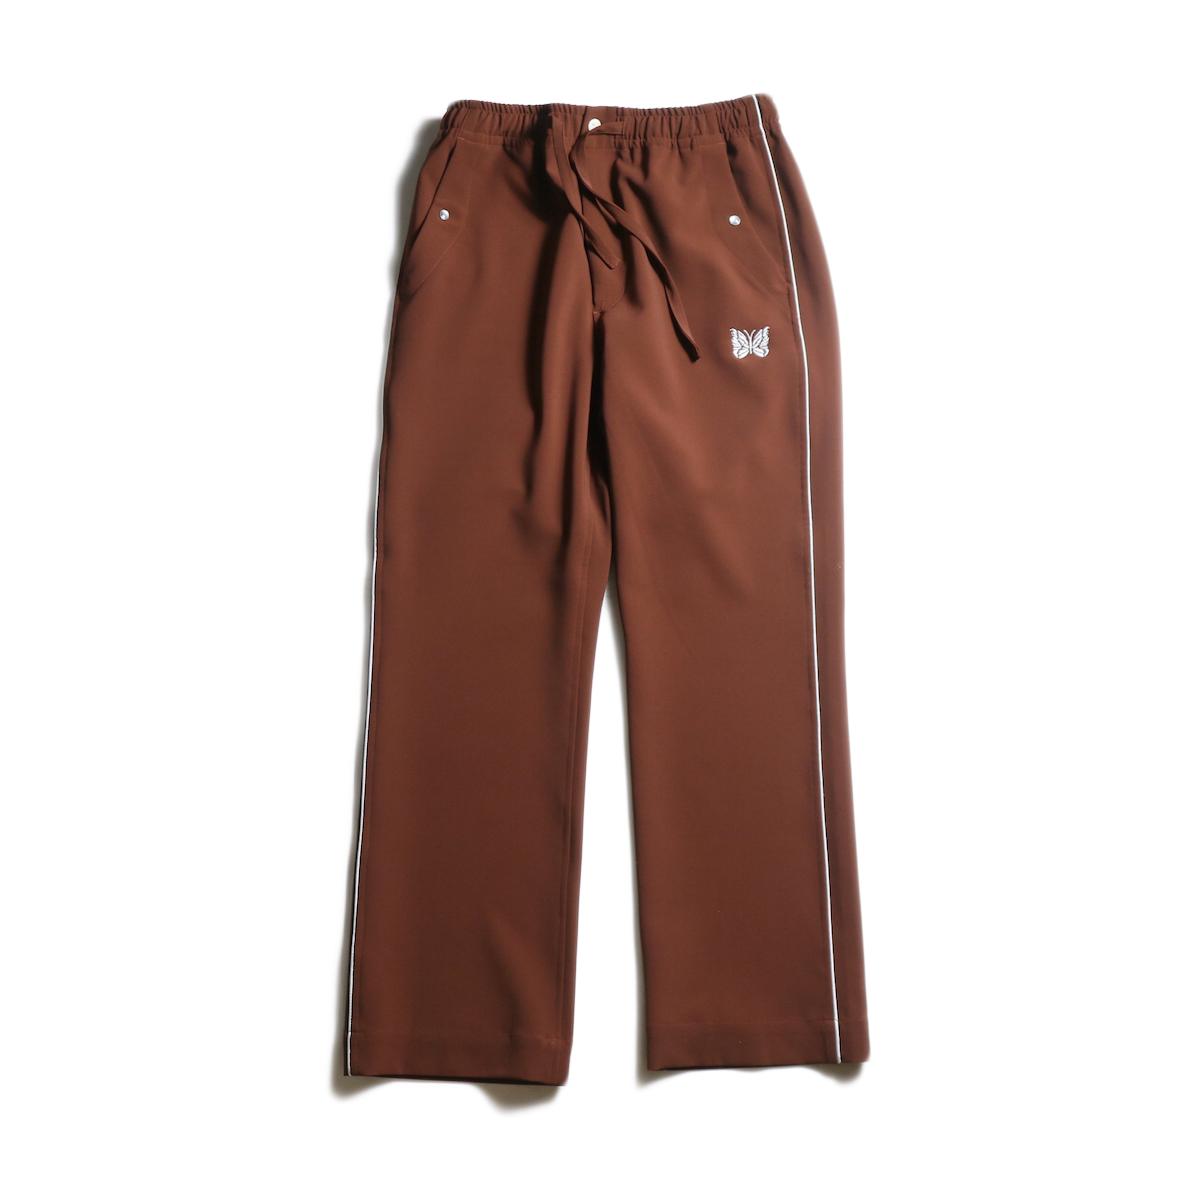 Needles / Piping Cowboy Pant - PE/PU Double Cloth (Brown)